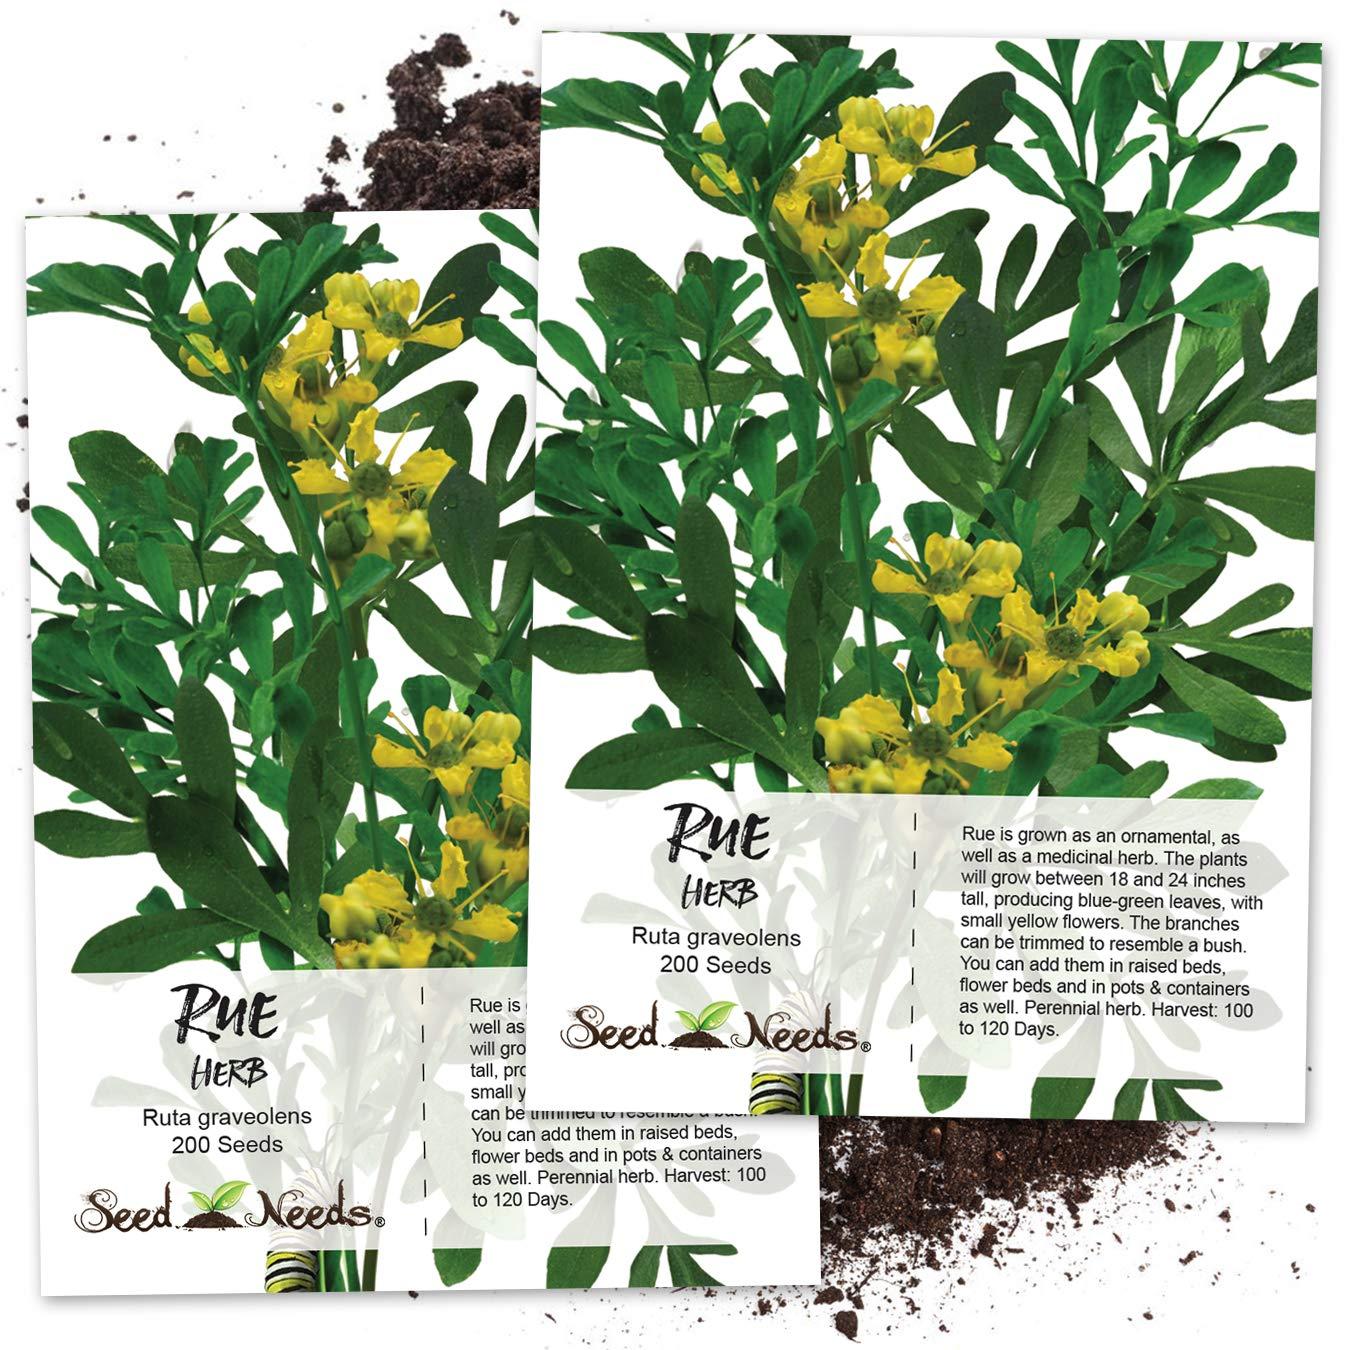 Amazon Seed Needs Rue Herb Ruta Graveolens Twin Pack Of 200